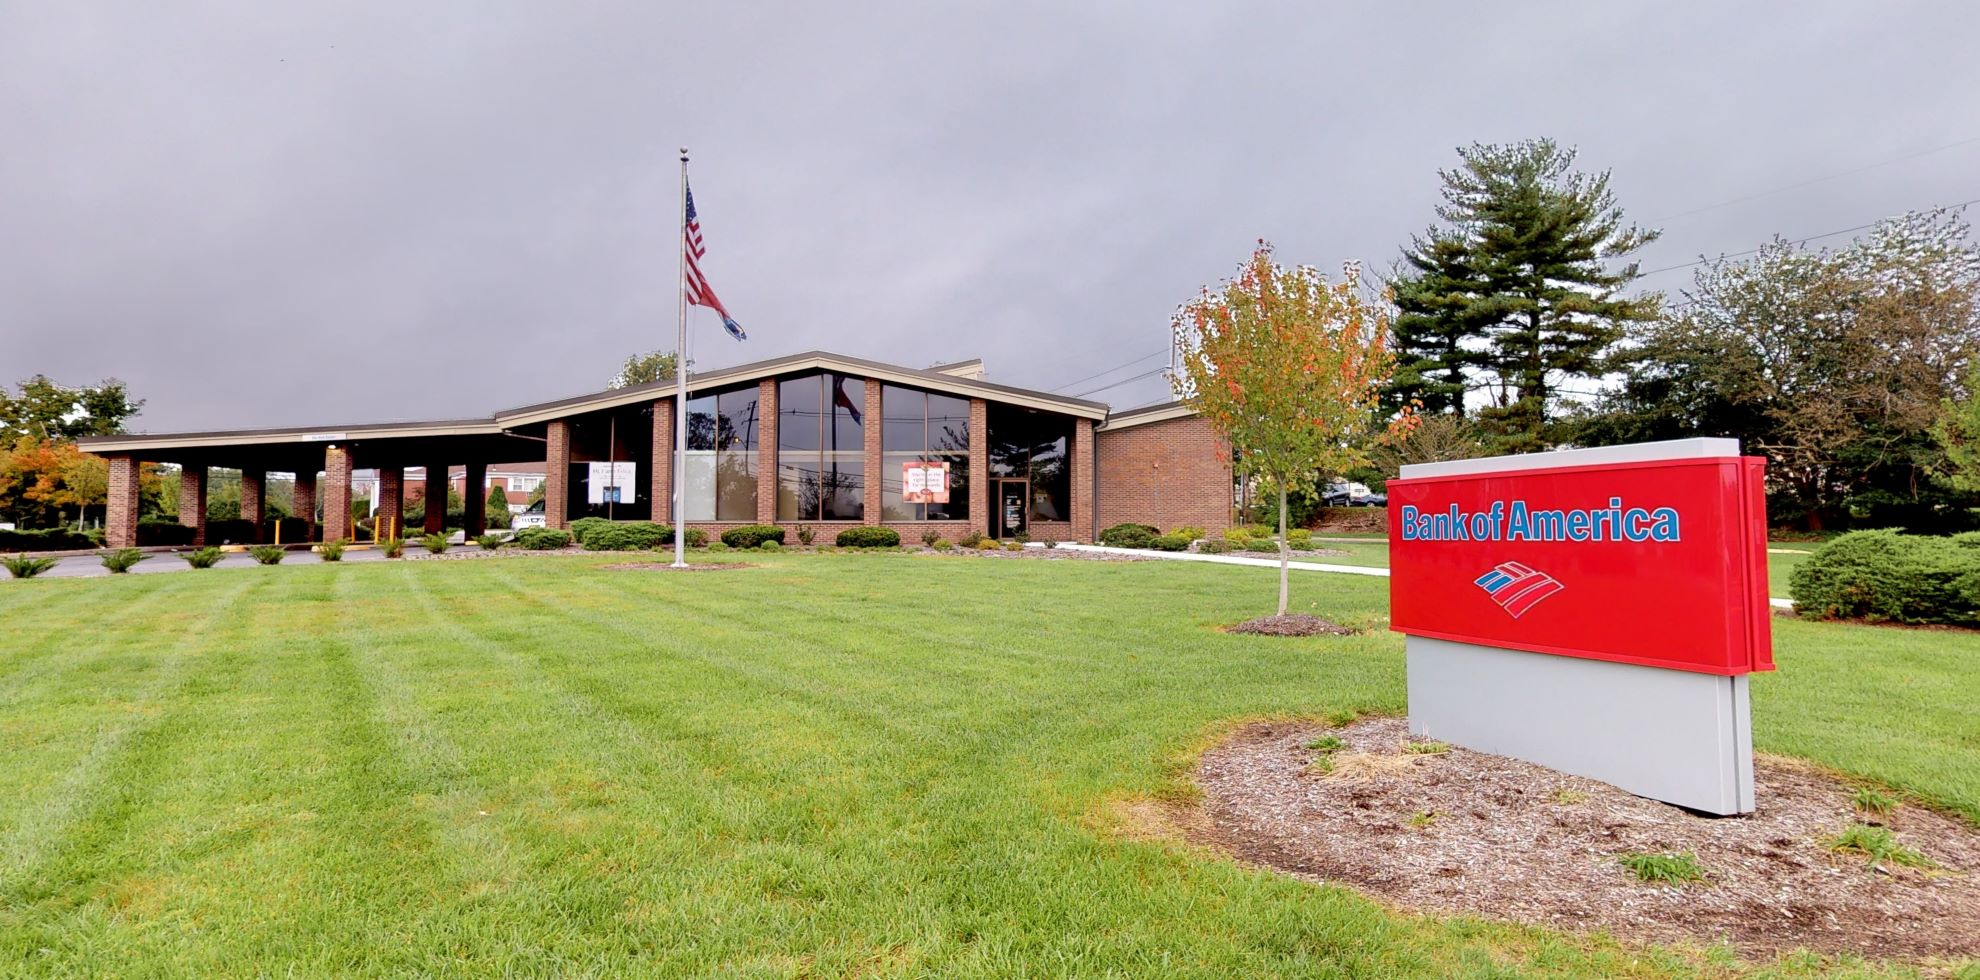 Bank of America financial center with drive-thru ATM | 80 Chestnut Ridge Rd, Montvale, NJ 07645